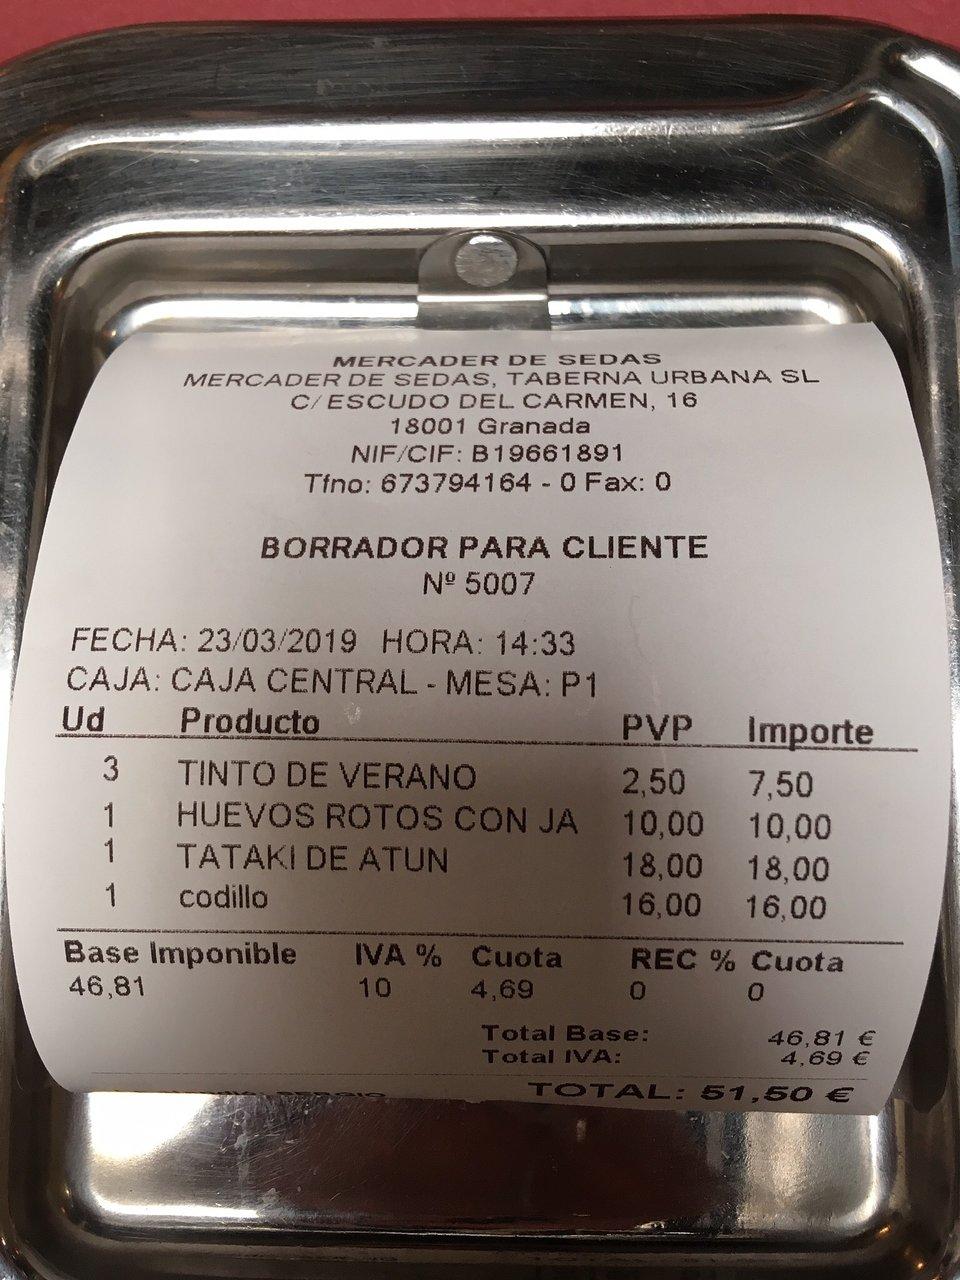 HOSTEL CASA MERCADER DE SEDAS - Prices & Reviews (Granada, Spain